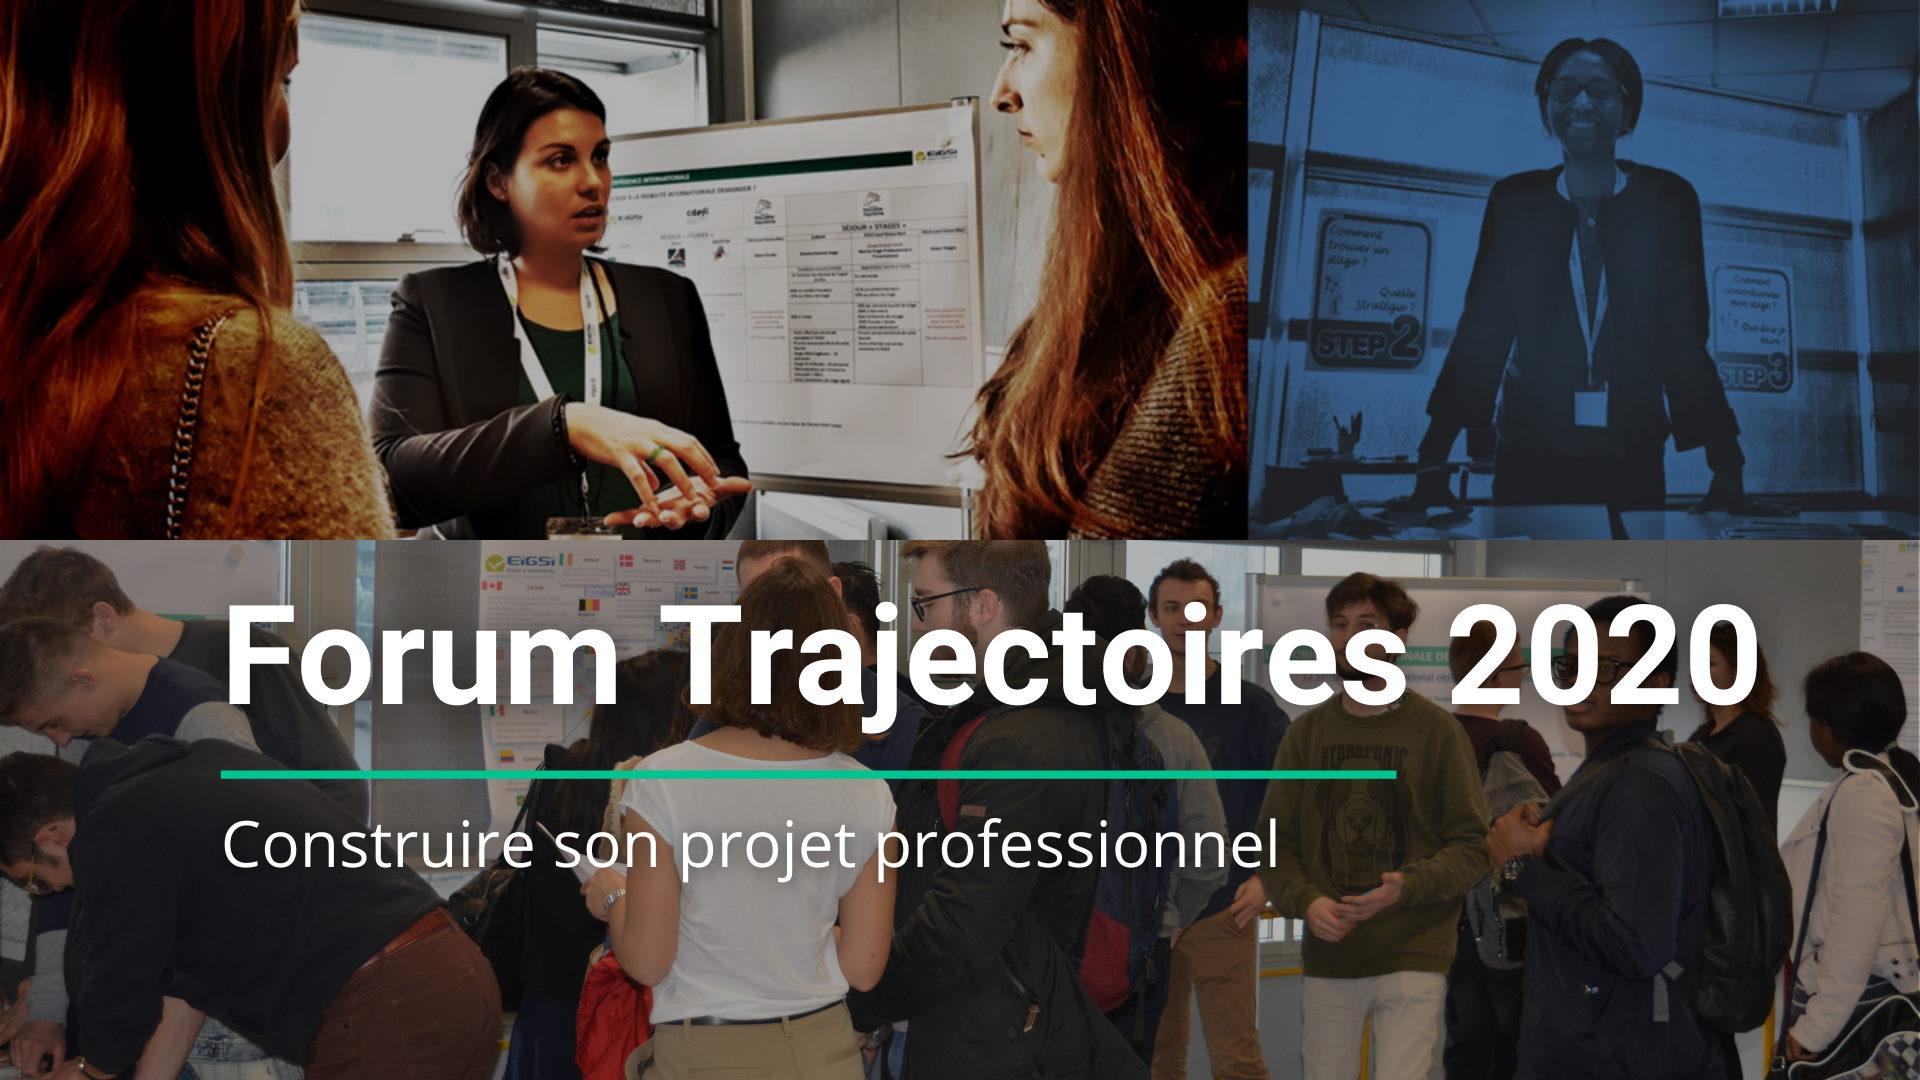 forum trajectoires 2020